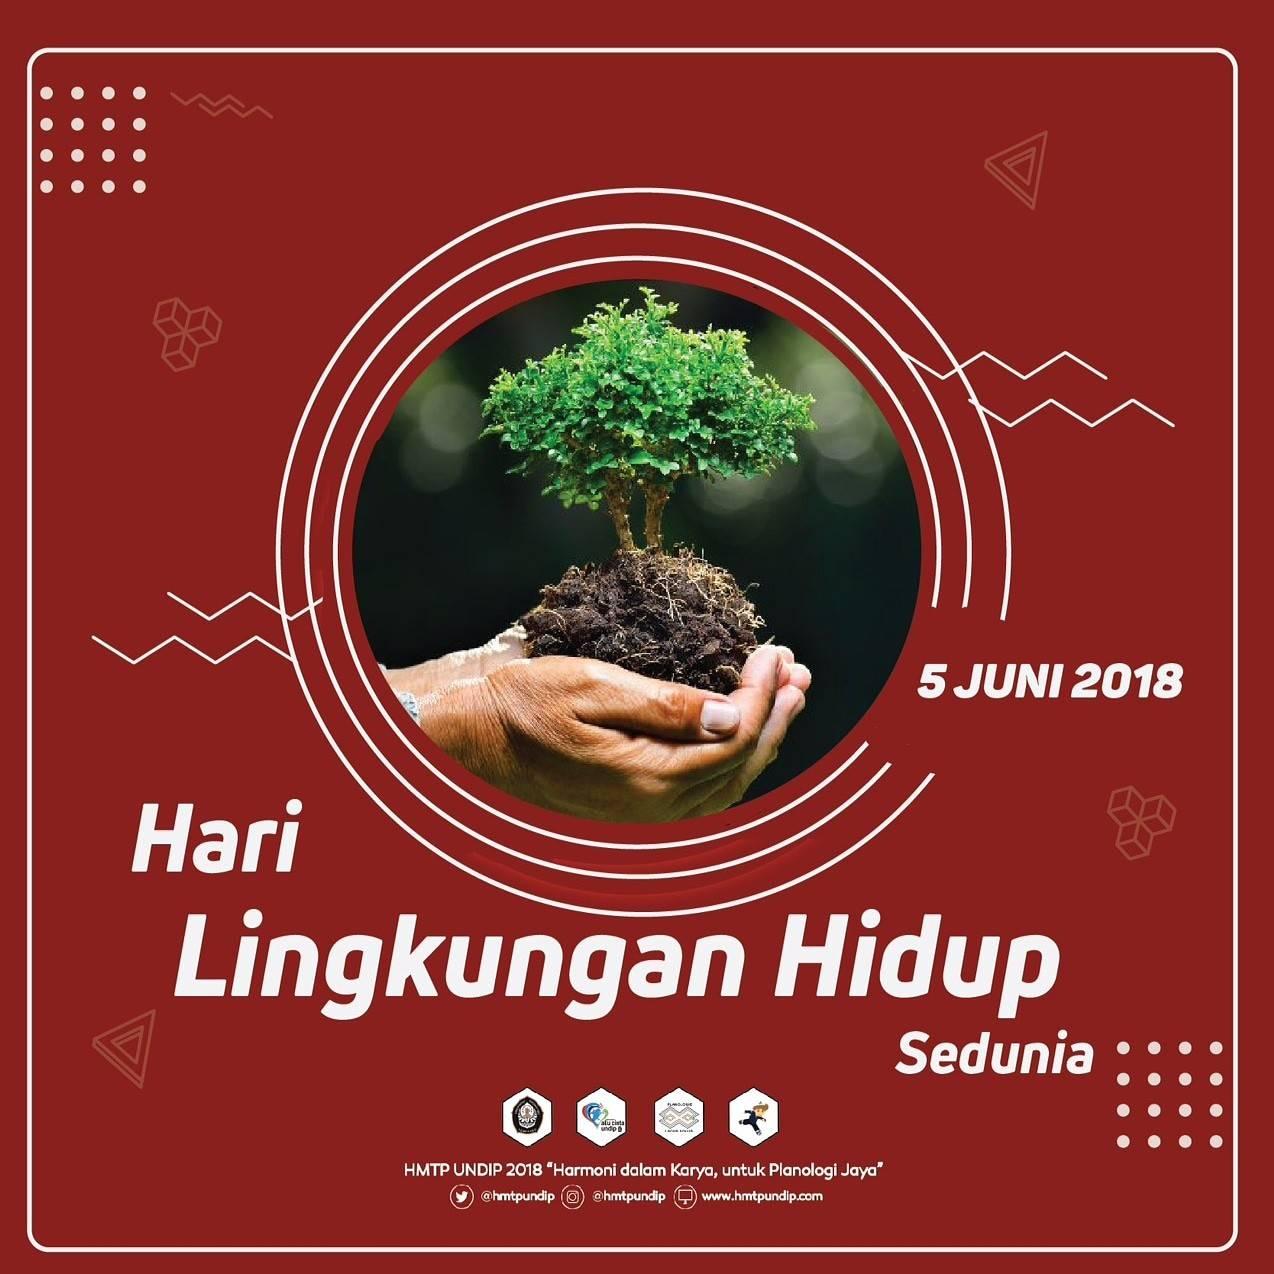 Hari Lingkungan Hidup International Hmtp Undip